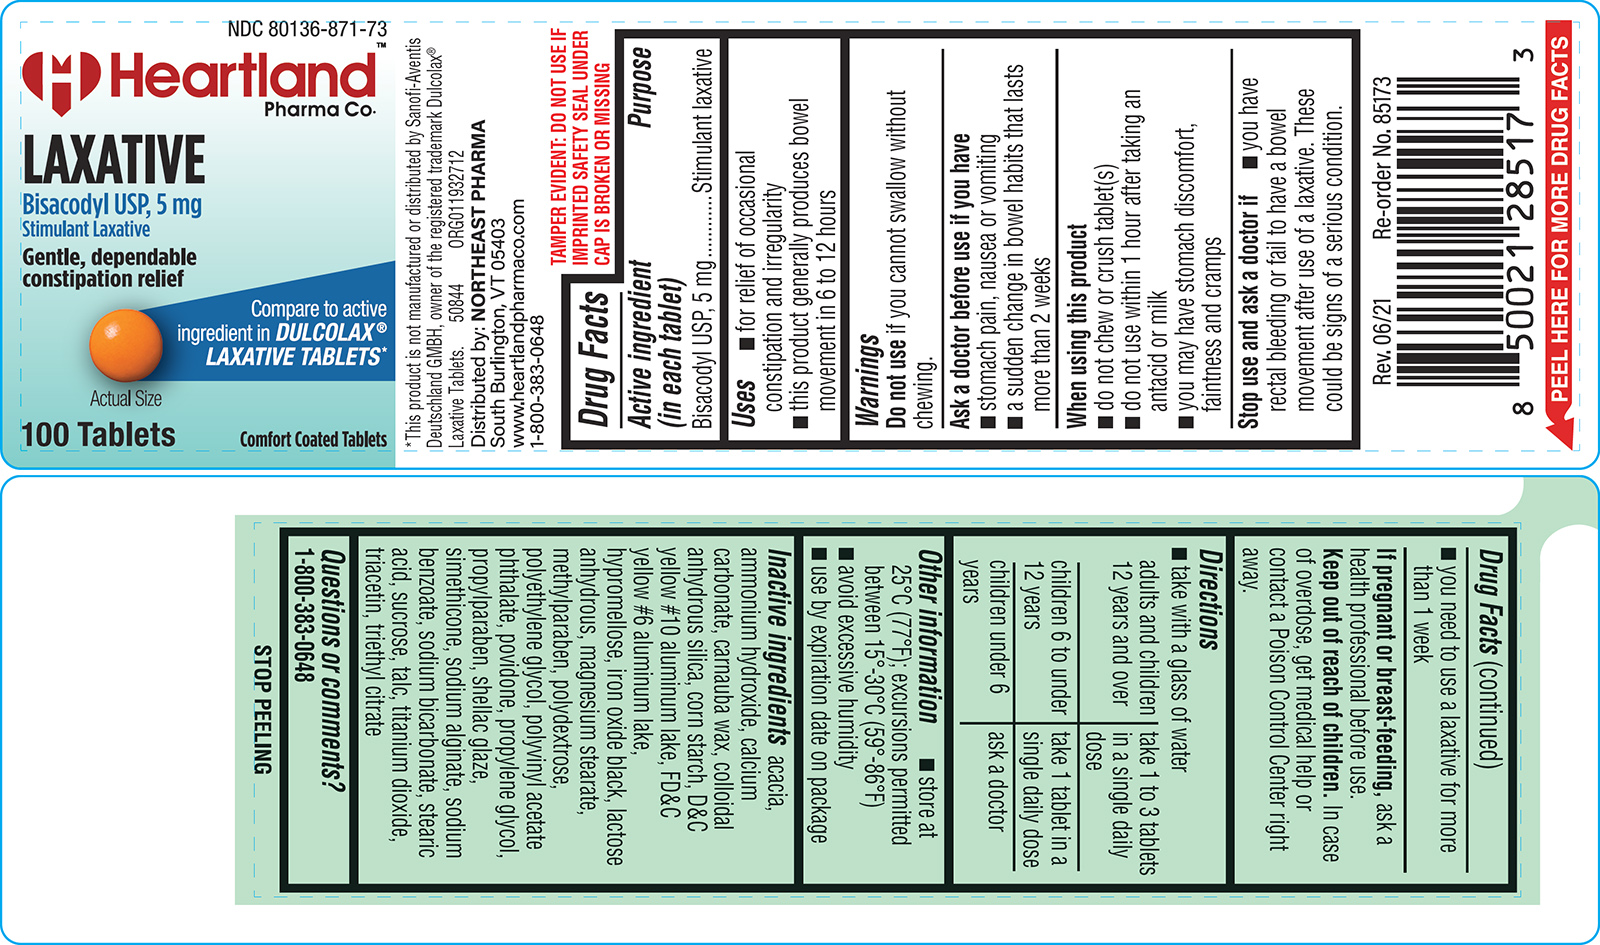 Heartland Pharma 44-327